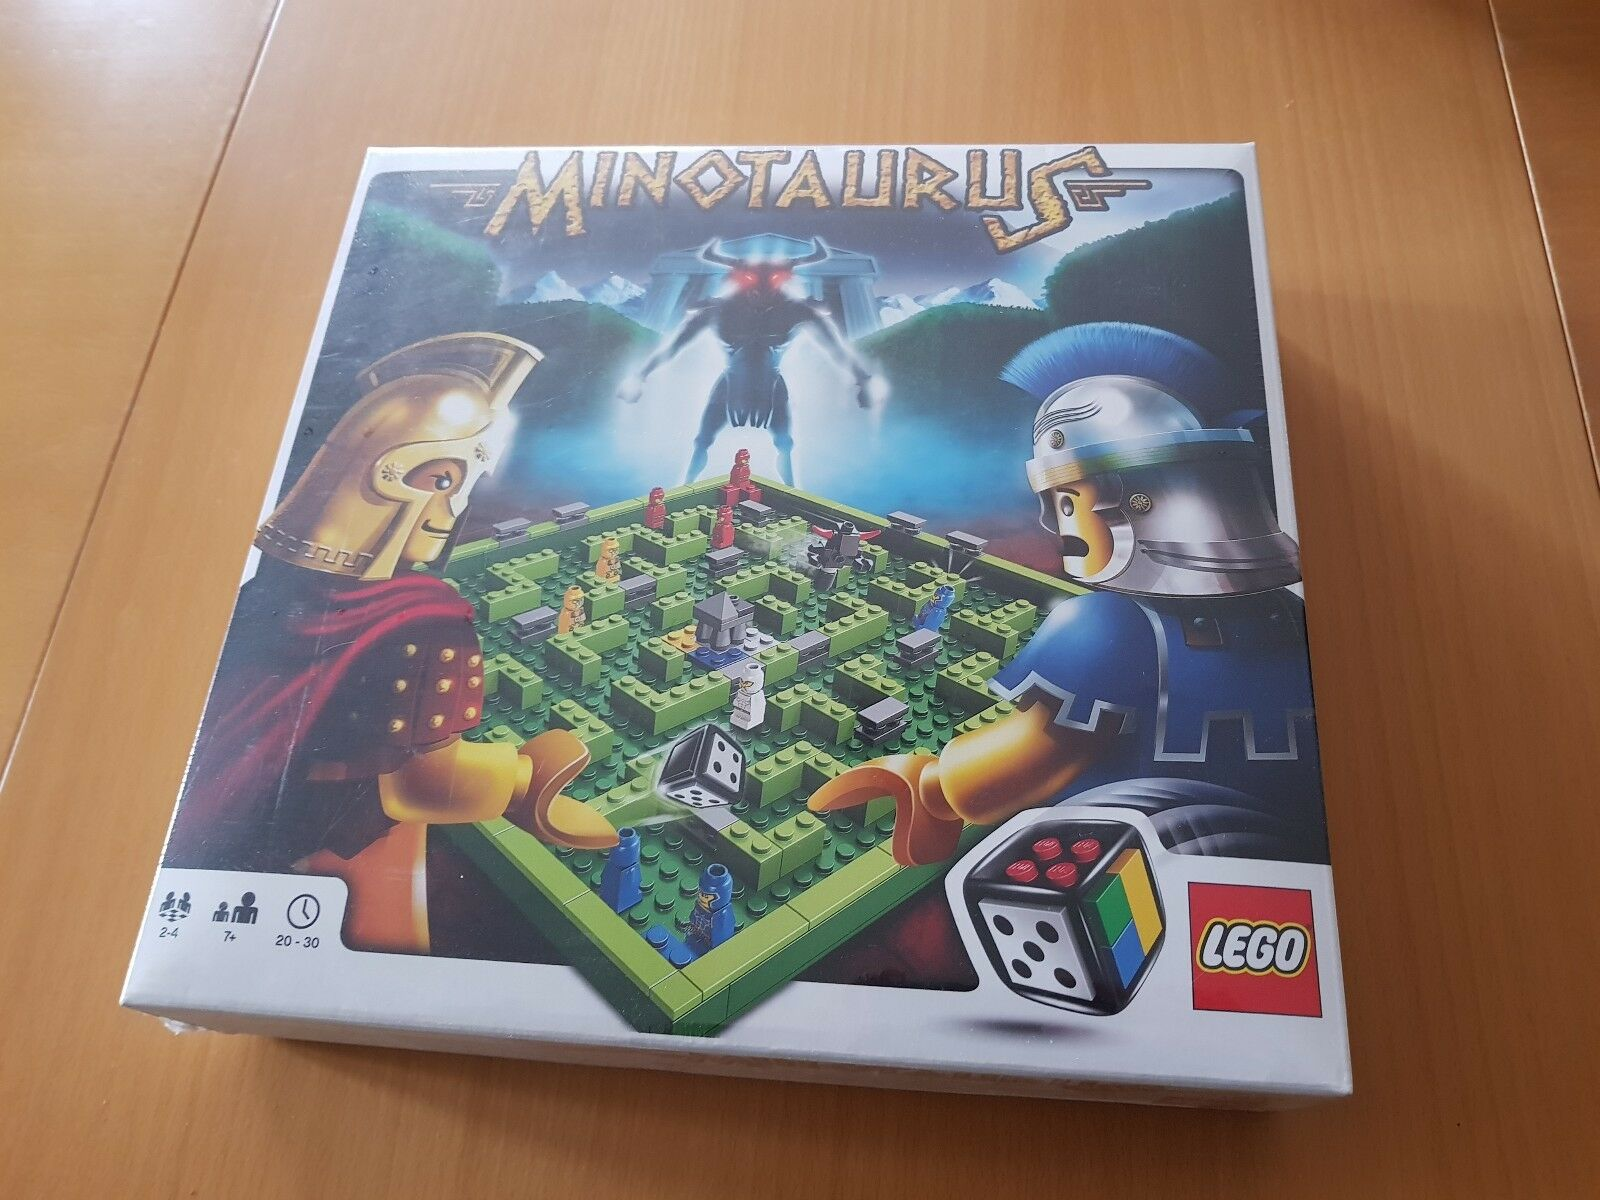 LEGO Spiel Minotaurus 3841 Neu    New Style